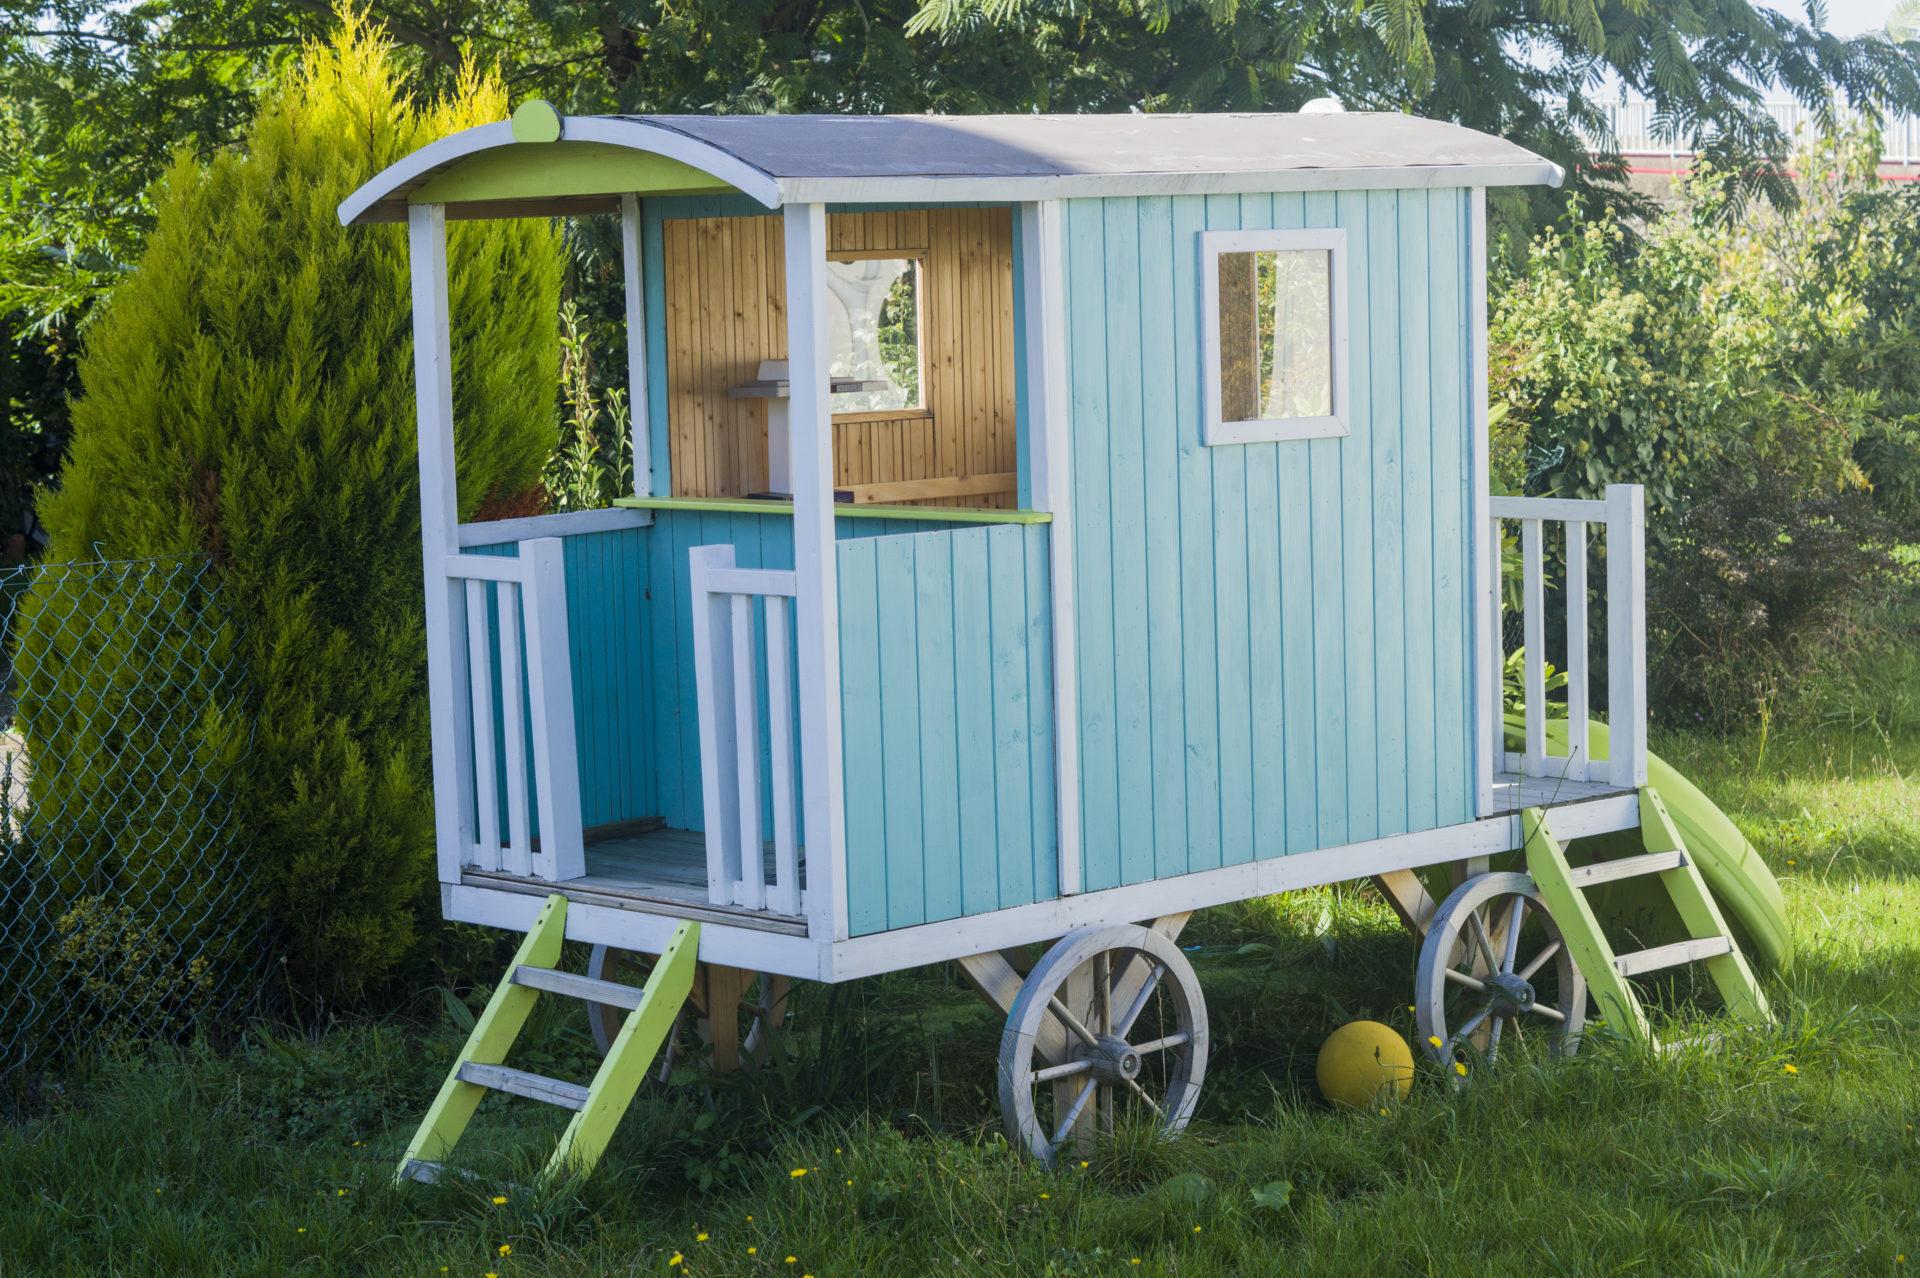 Cabane En Bois Pour Enfant, Cabane Jardin Enfant - Acheter ... intérieur Cabane De Jardin Enfant Pas Cher